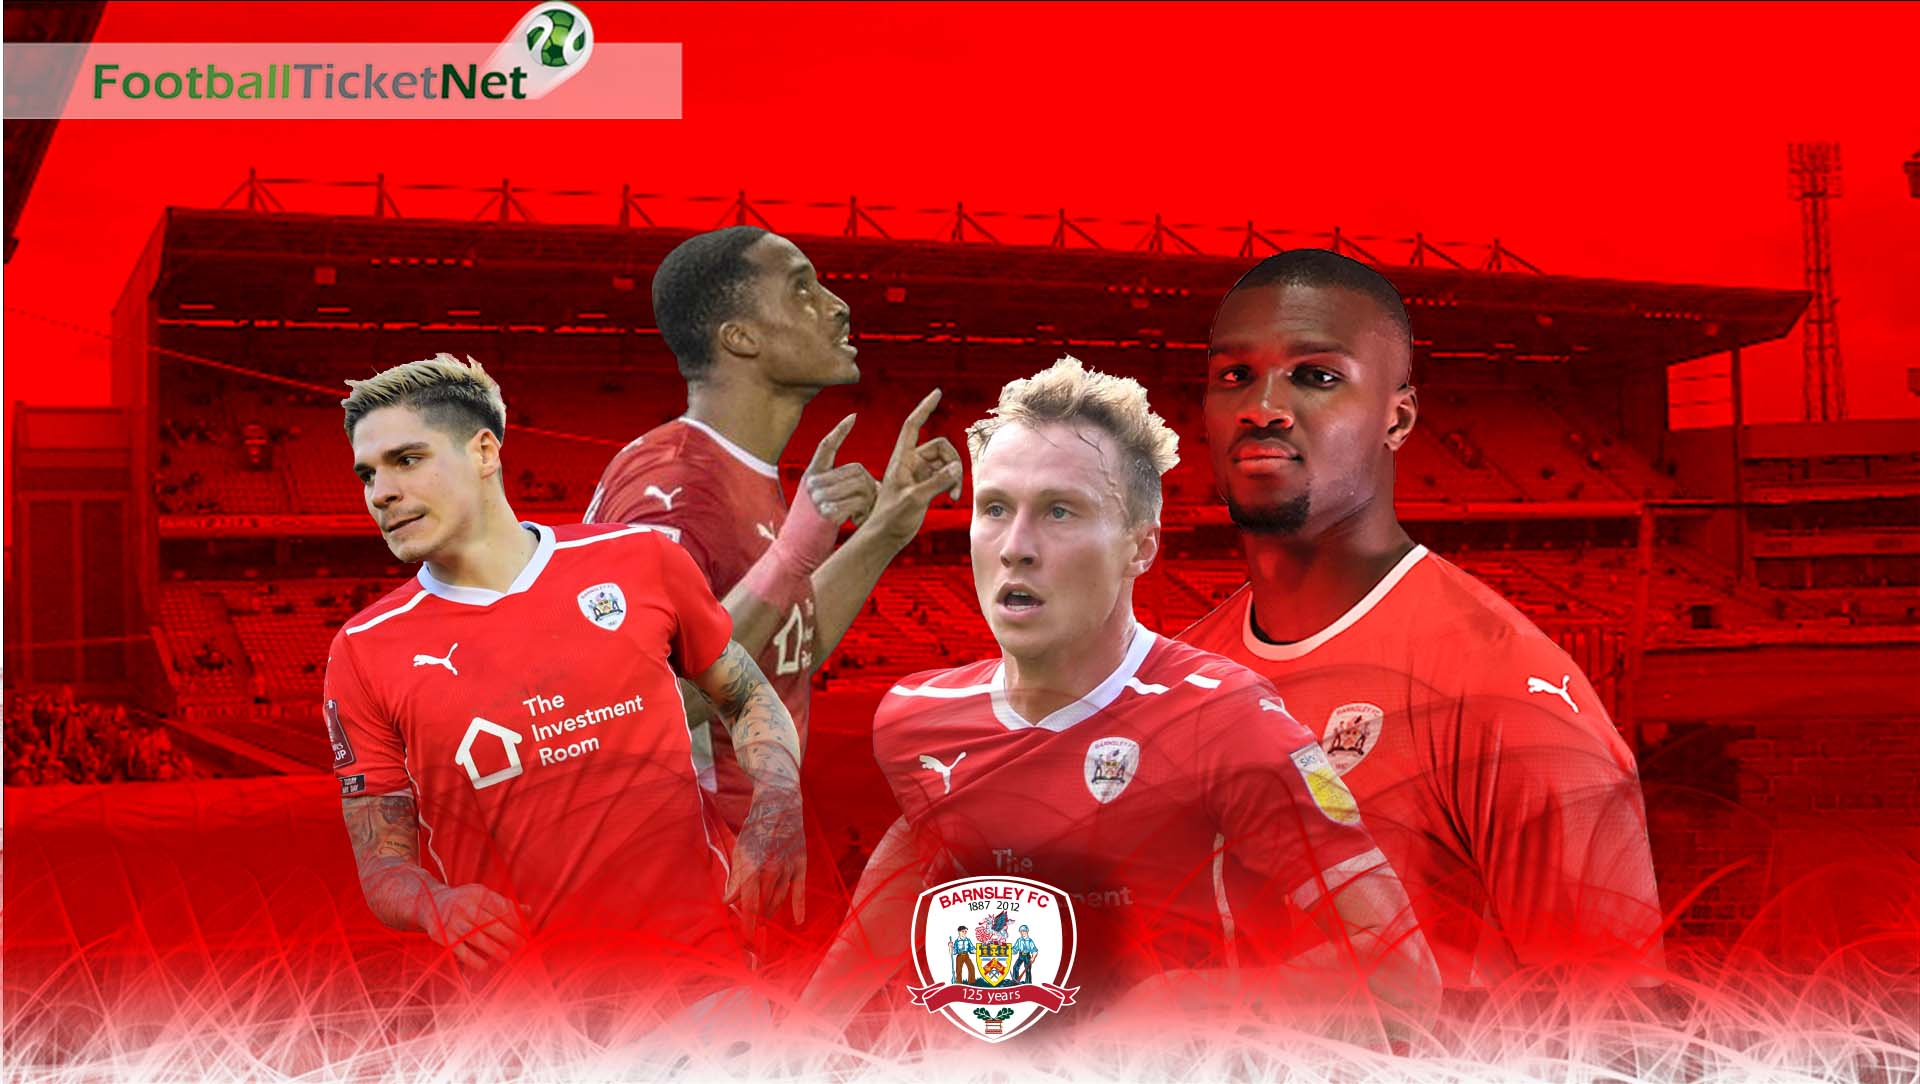 Buy Barnsley Football Tickets 2019 20 Football Ticket Net